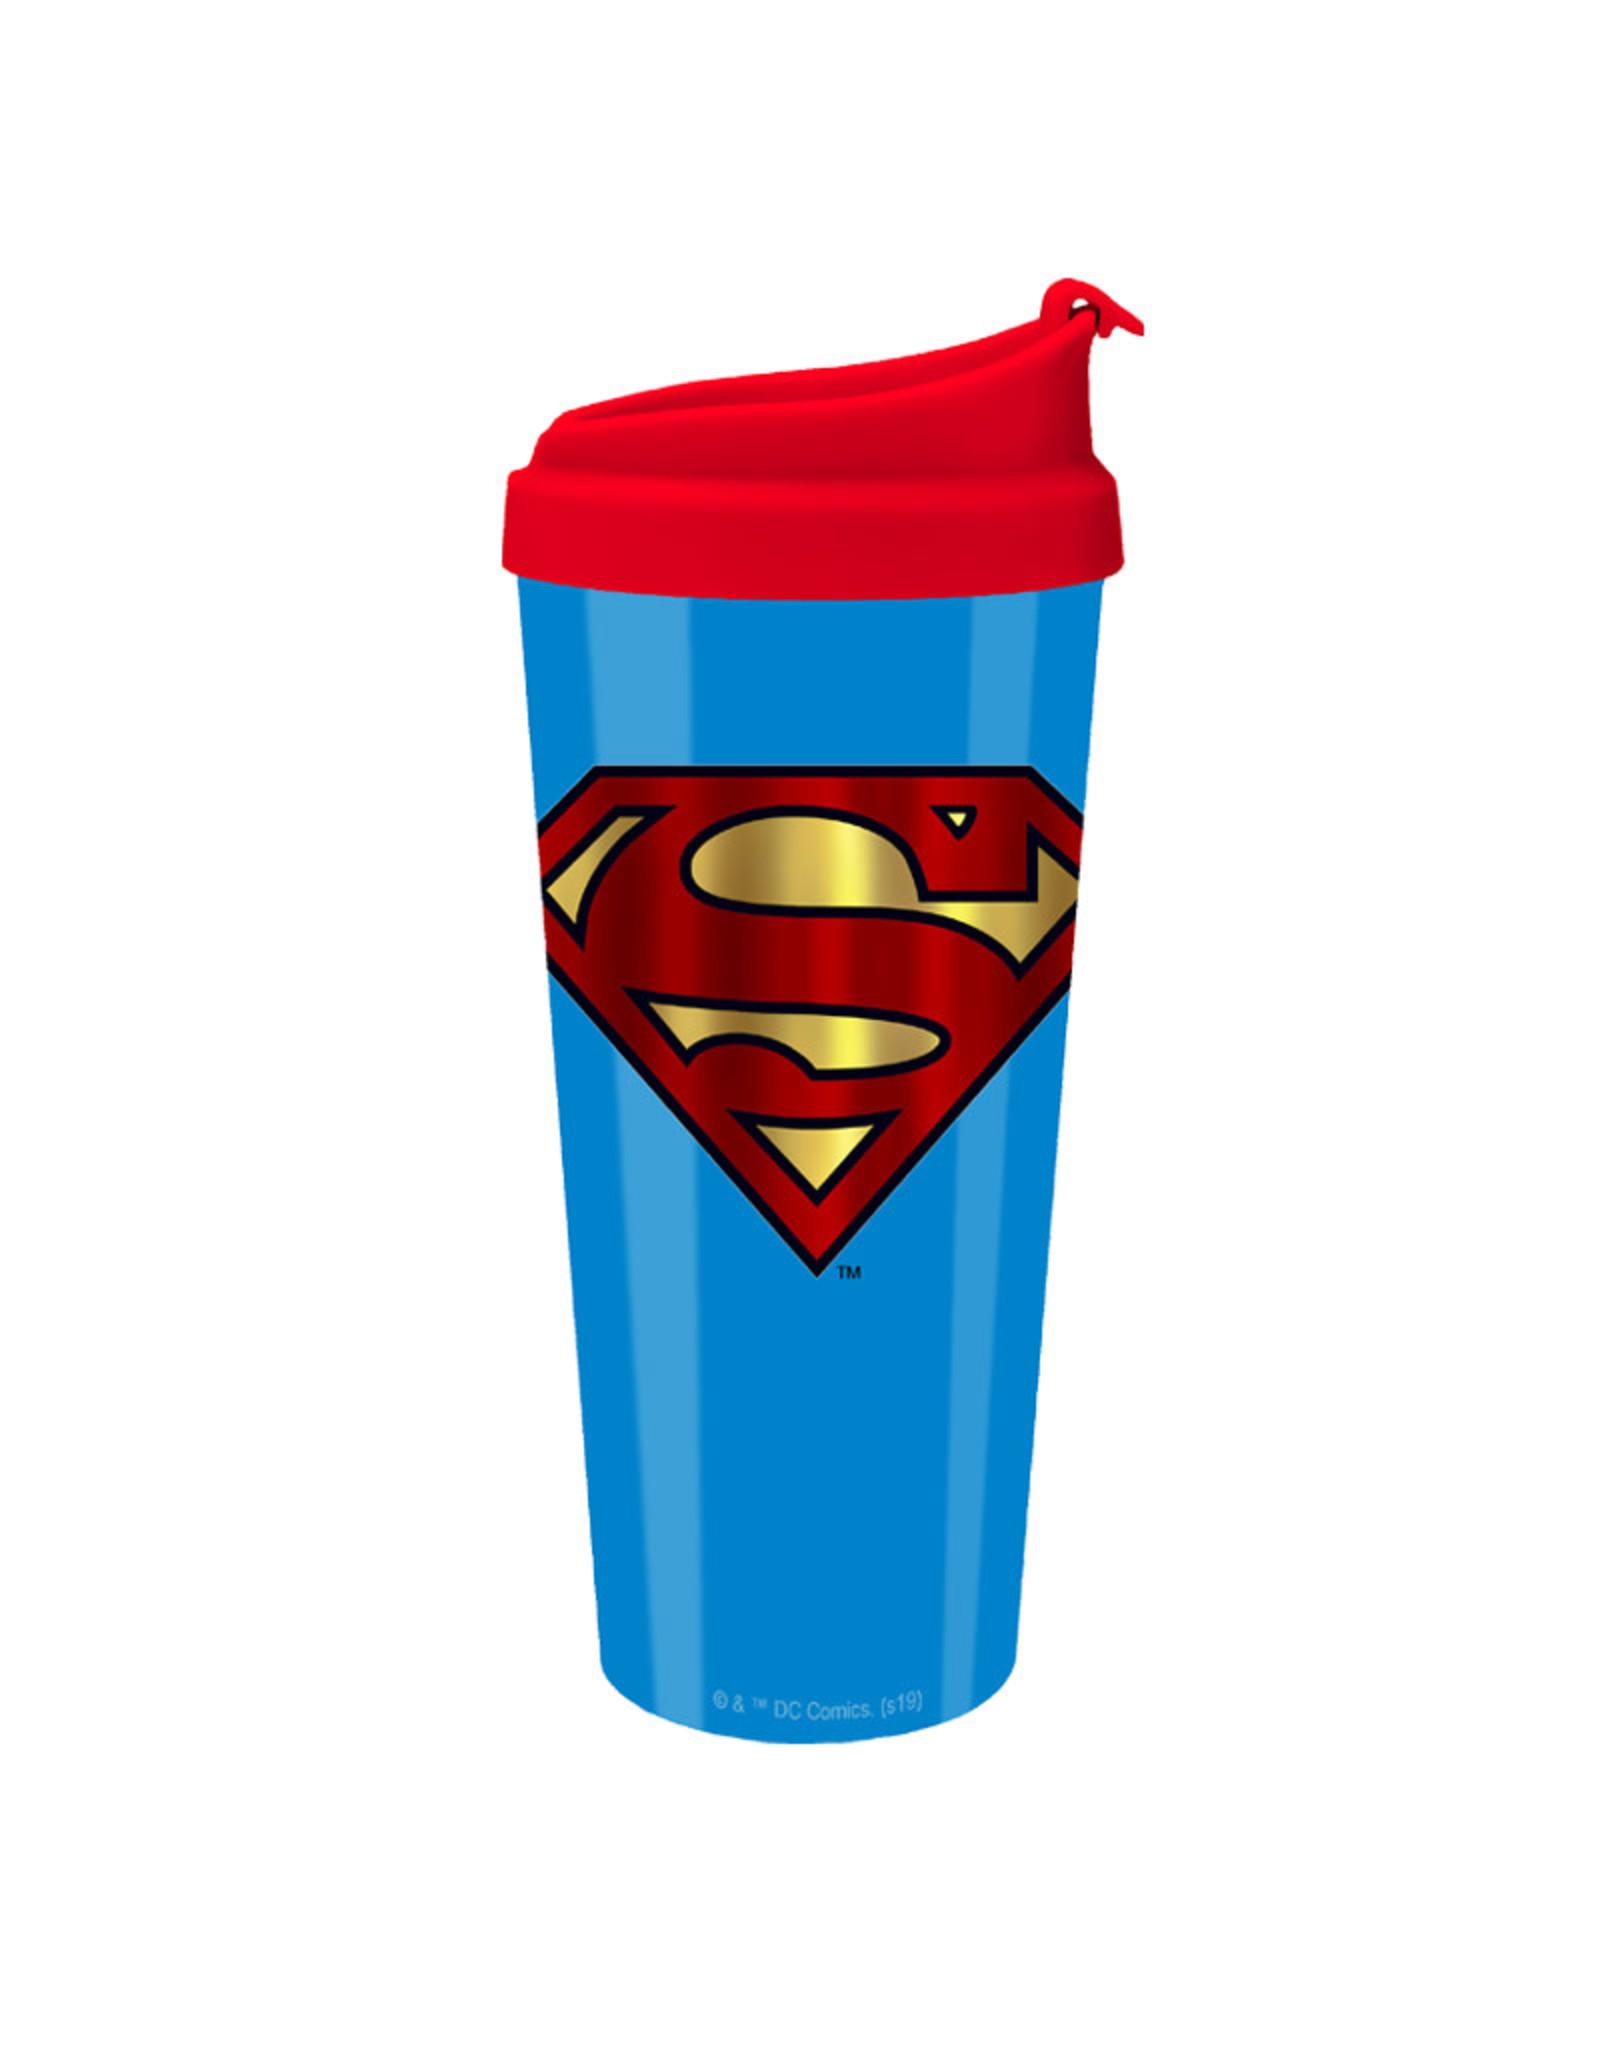 Dc comics Dc Comics ( Acrylic Mug ) Superman